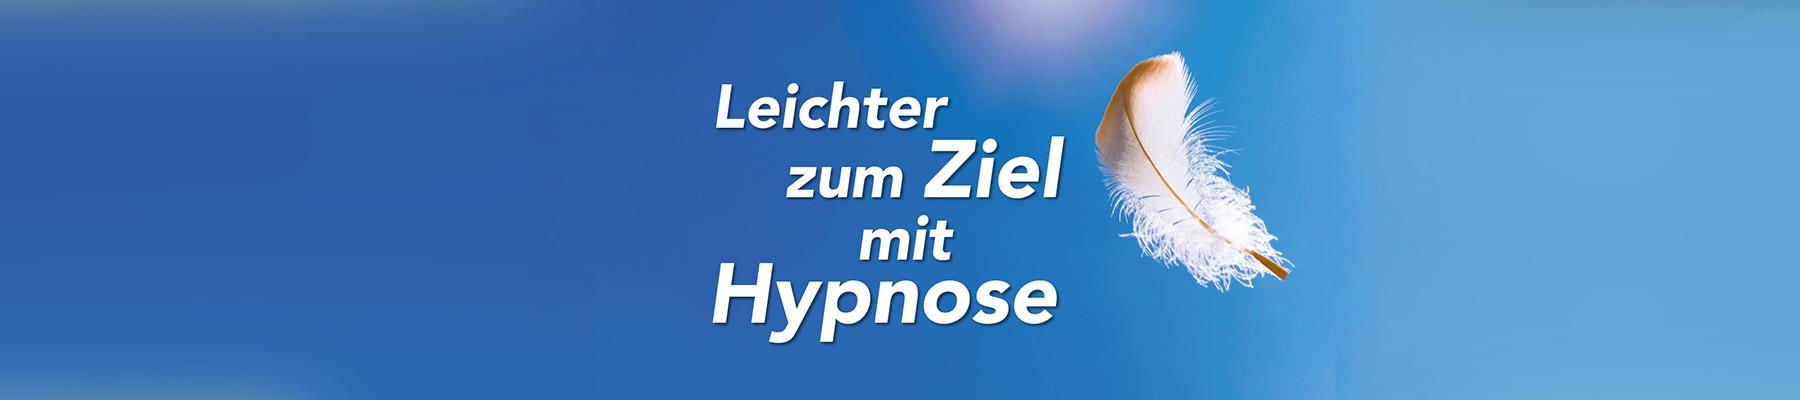 Preise Hypnose Hannover